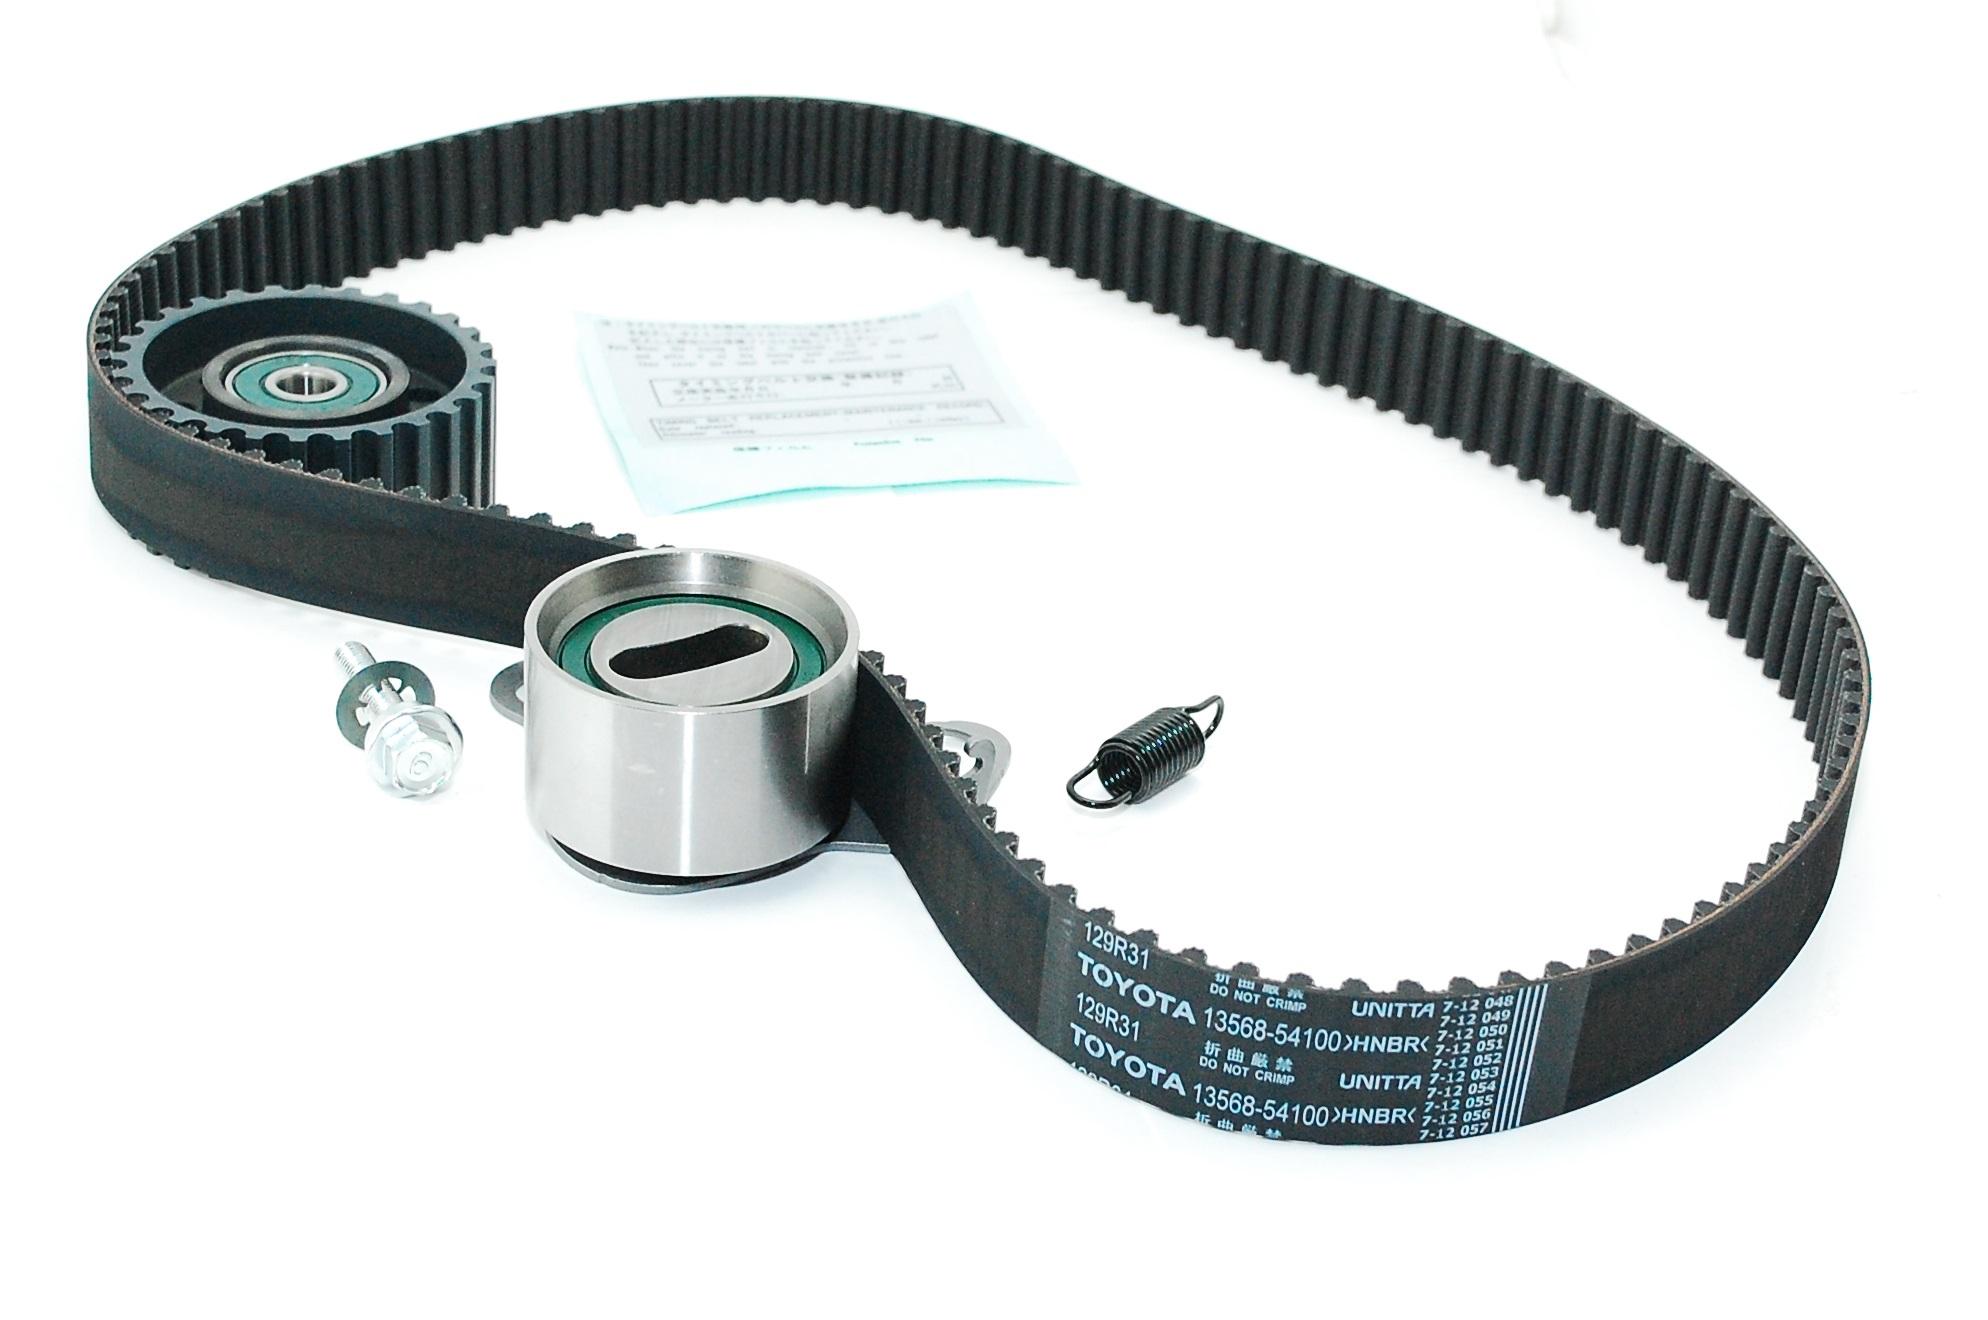 cam timing belt kit with genuine toyota belt